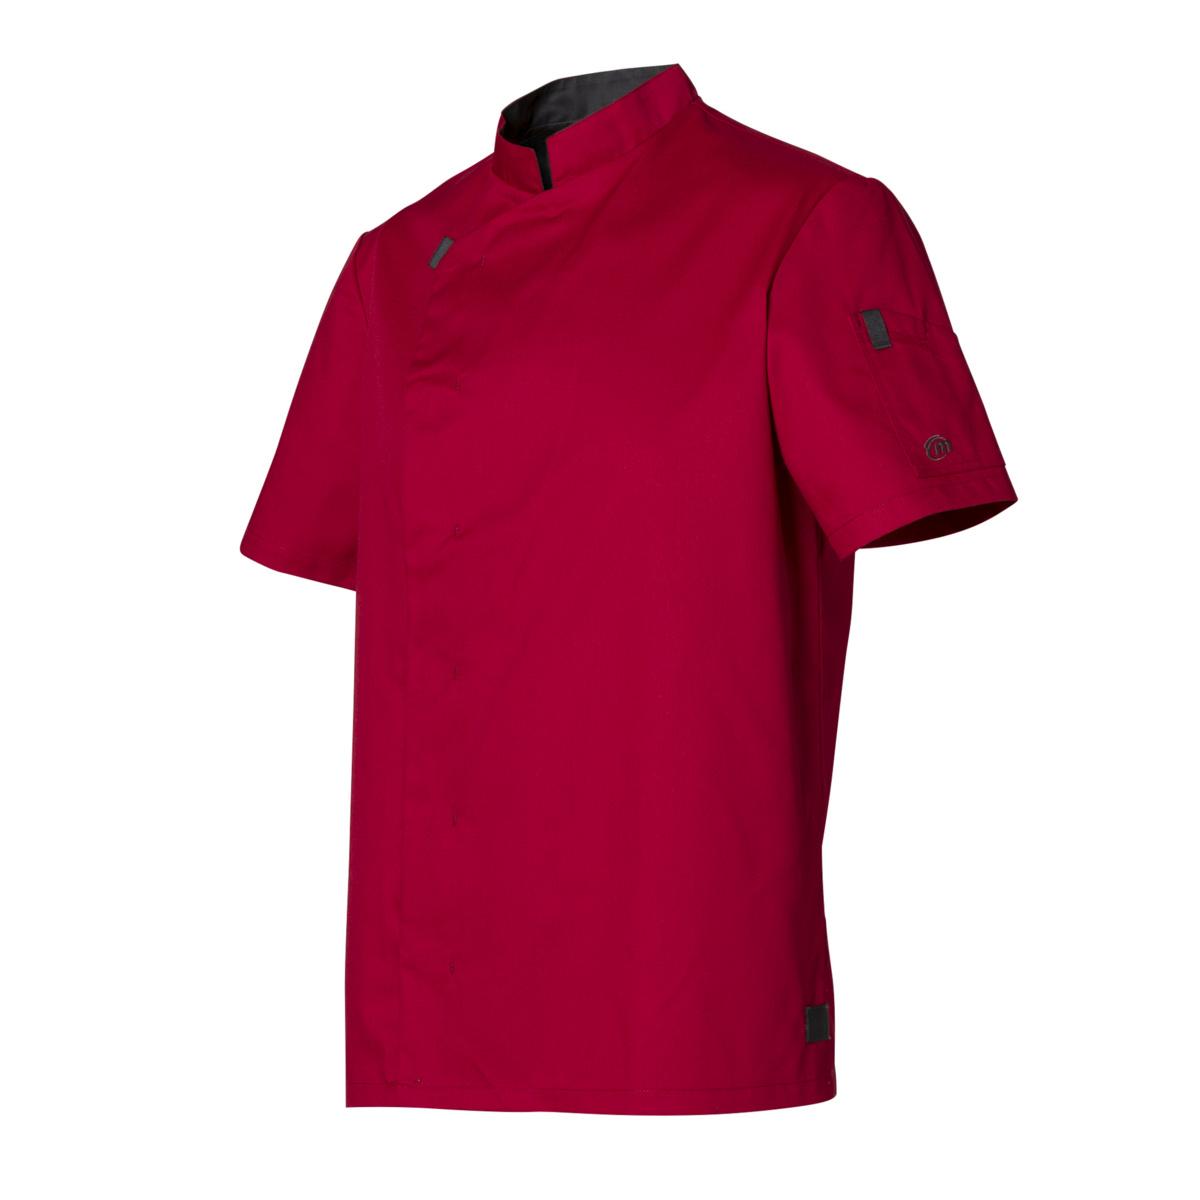 Veste de cuisine rouge taille 4 Shade Molinel